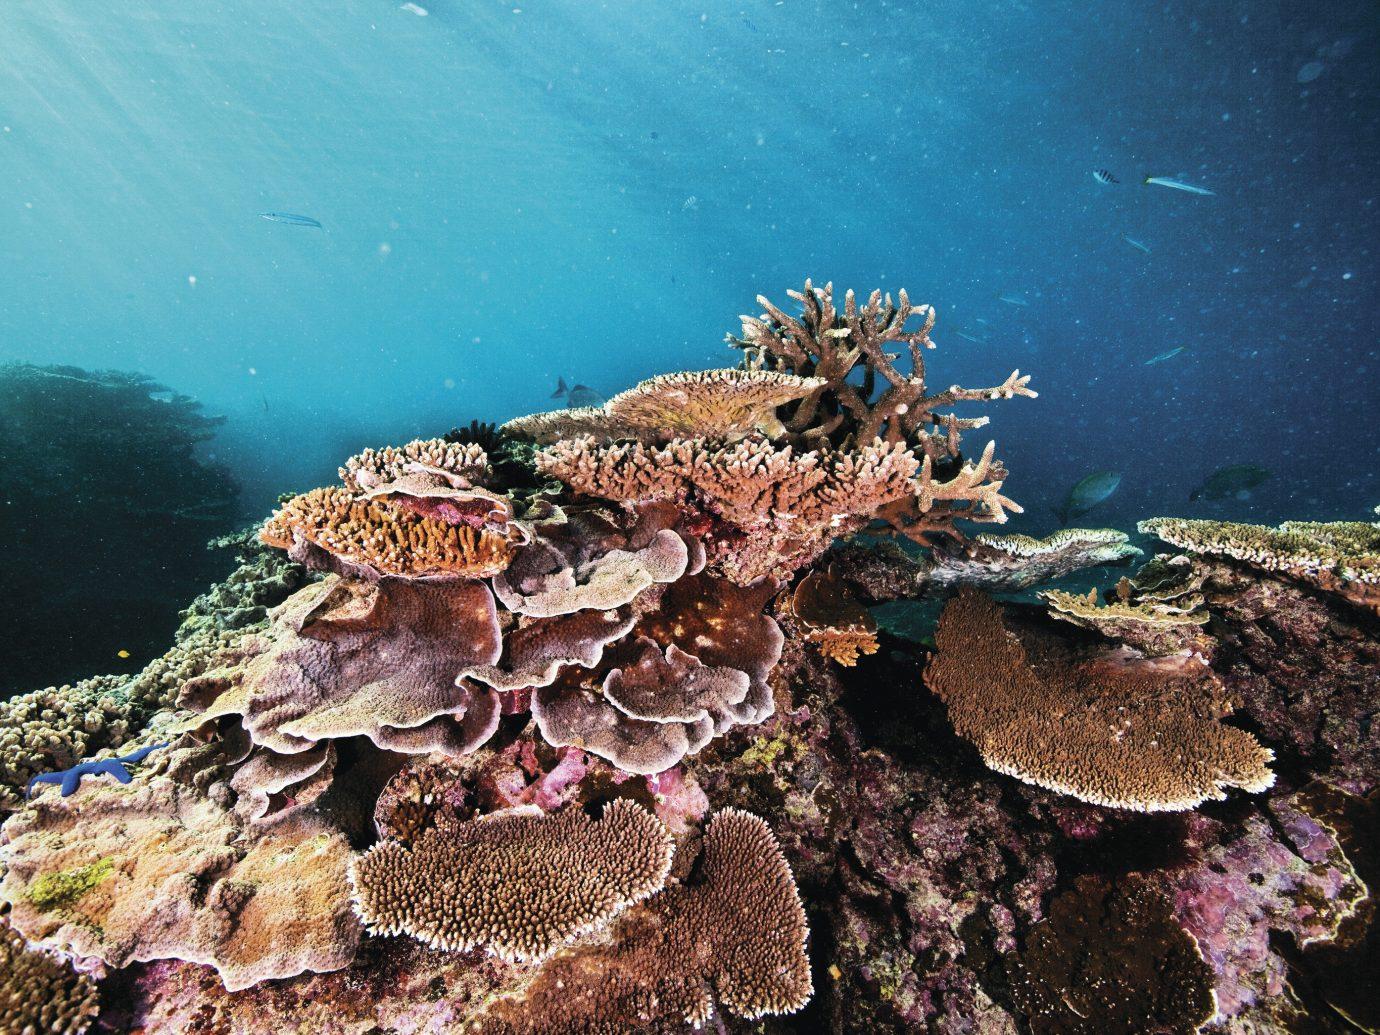 Trip Ideas reef coral reef marine biology rock underwater natural environment biology Sea coral Ocean coral reef fish aquarium invertebrate